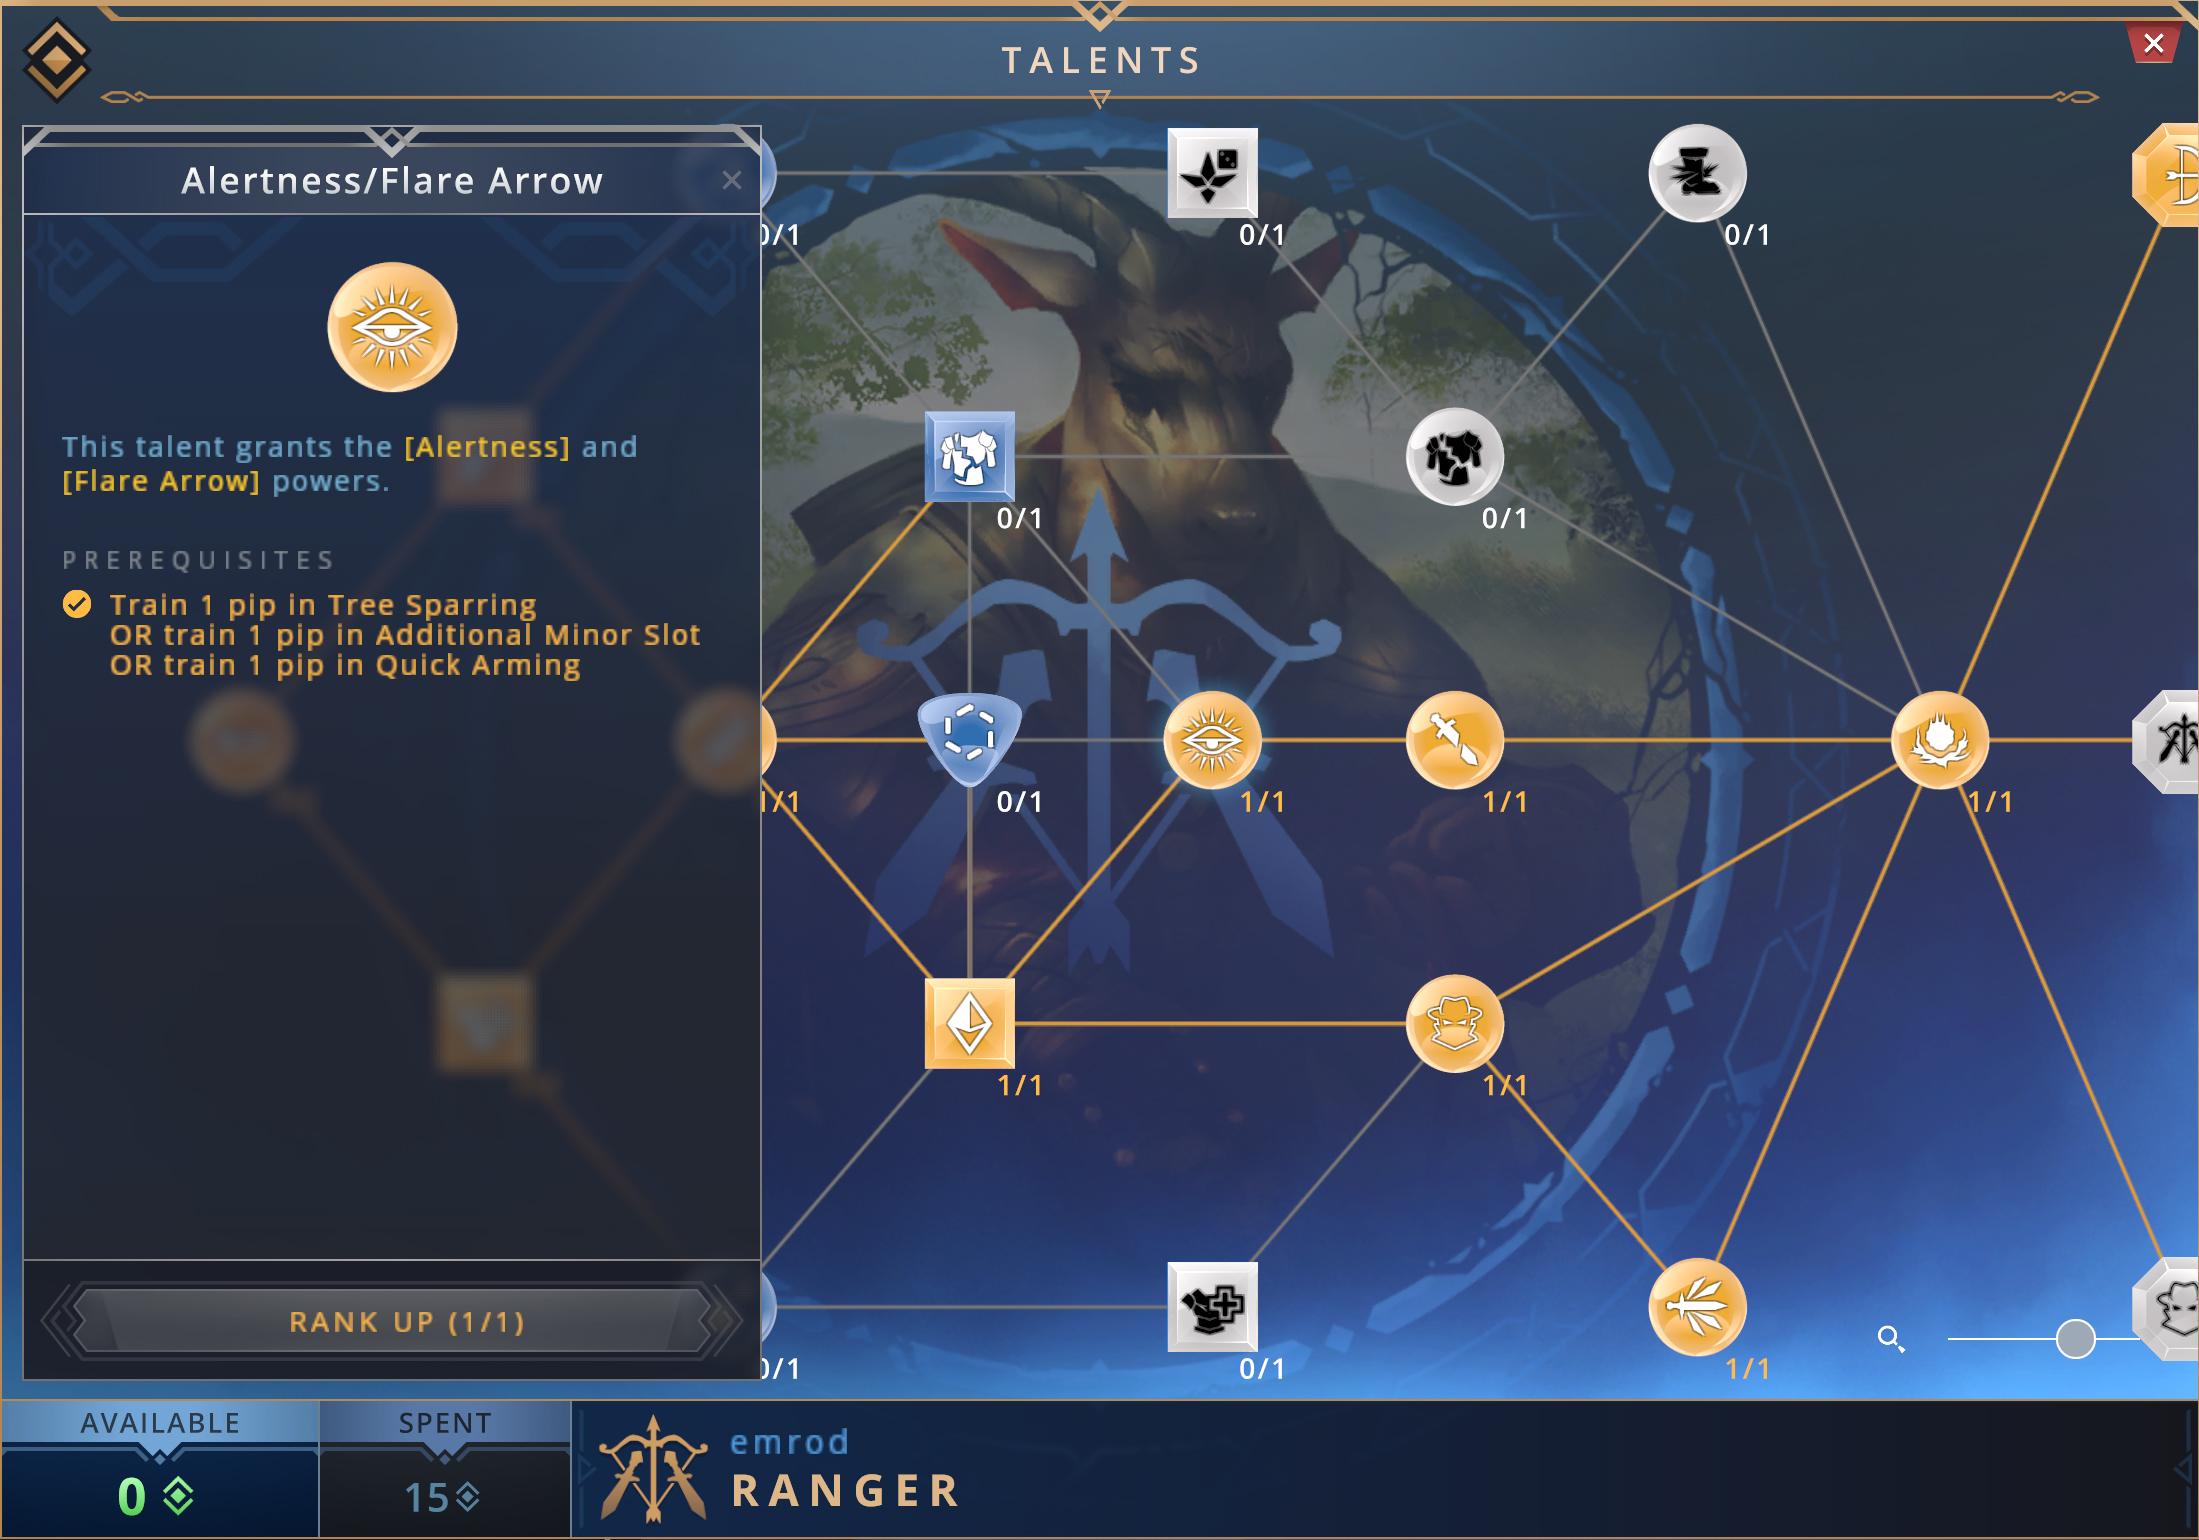 06_RangerTalents_Alert_Flare_Arrow.jpg